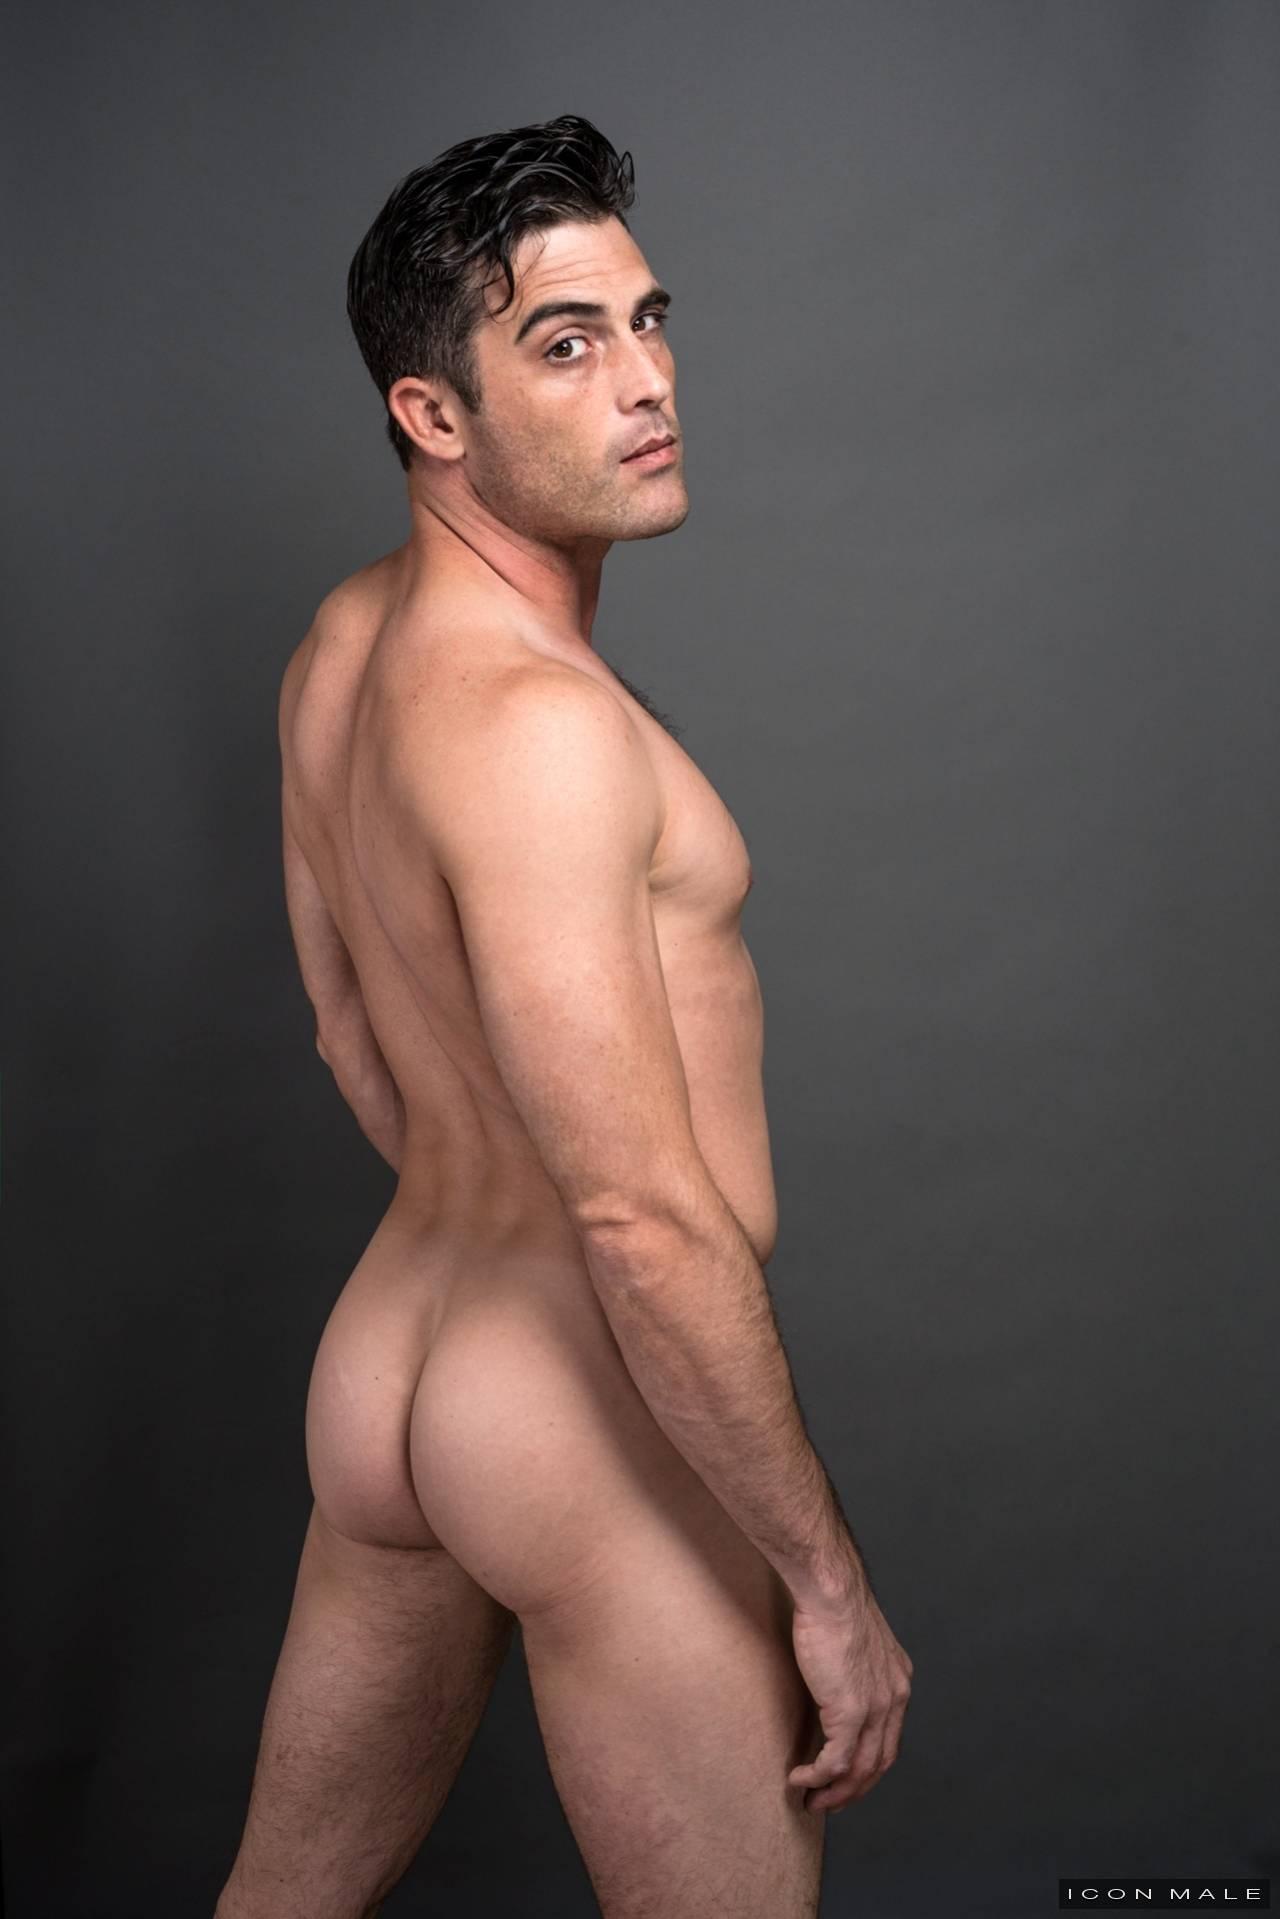 lance hart icon male gay porn